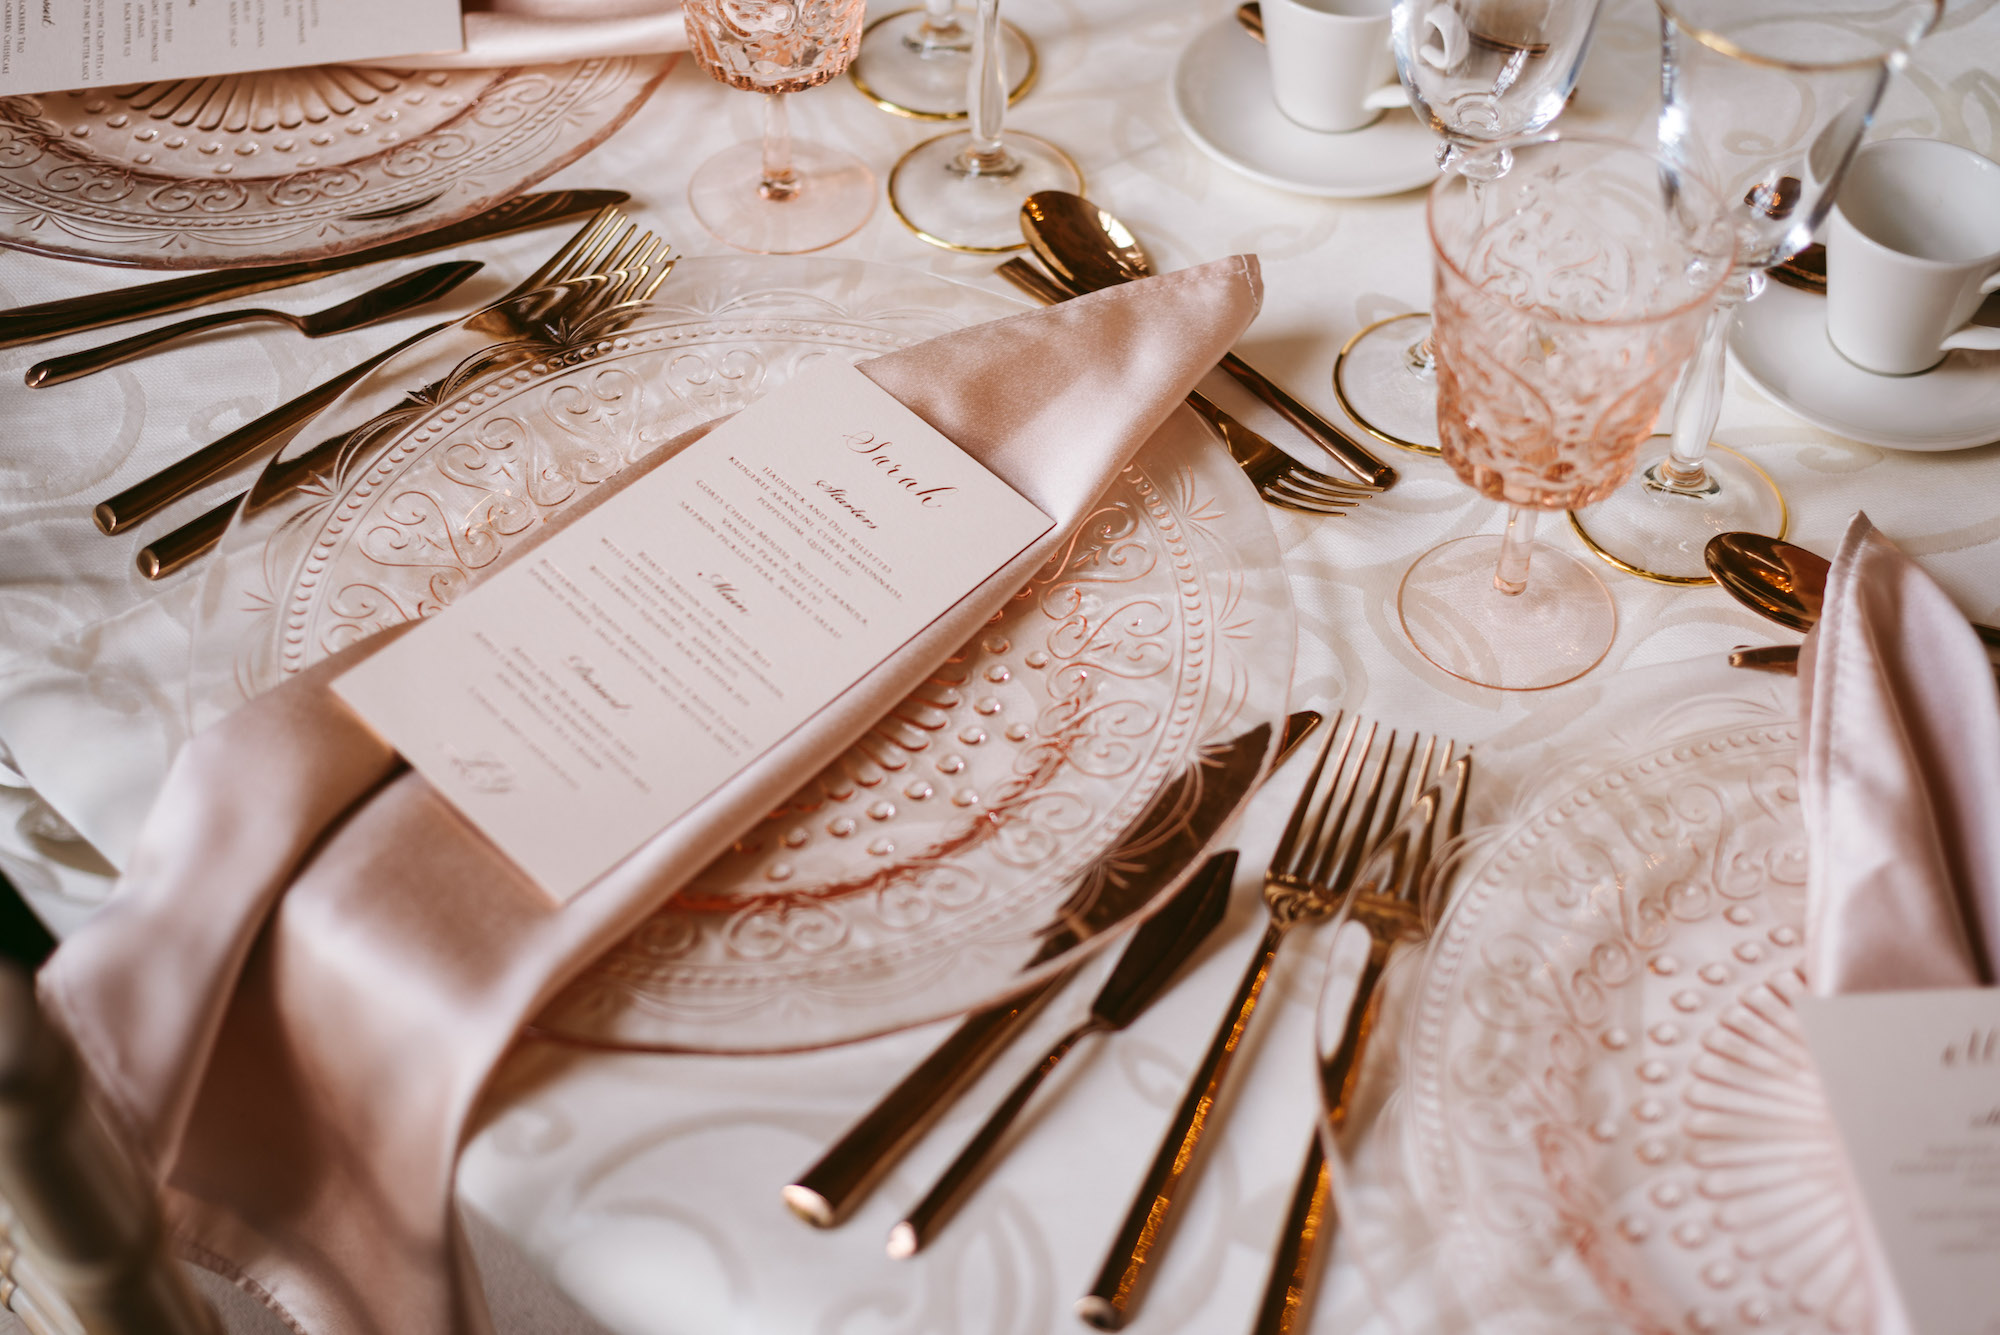 73   Hengrave Hall Wedding   Suffolk Wedding   Lamare London   Luxury Wedding Planner   Jon Mold Photography.jpg